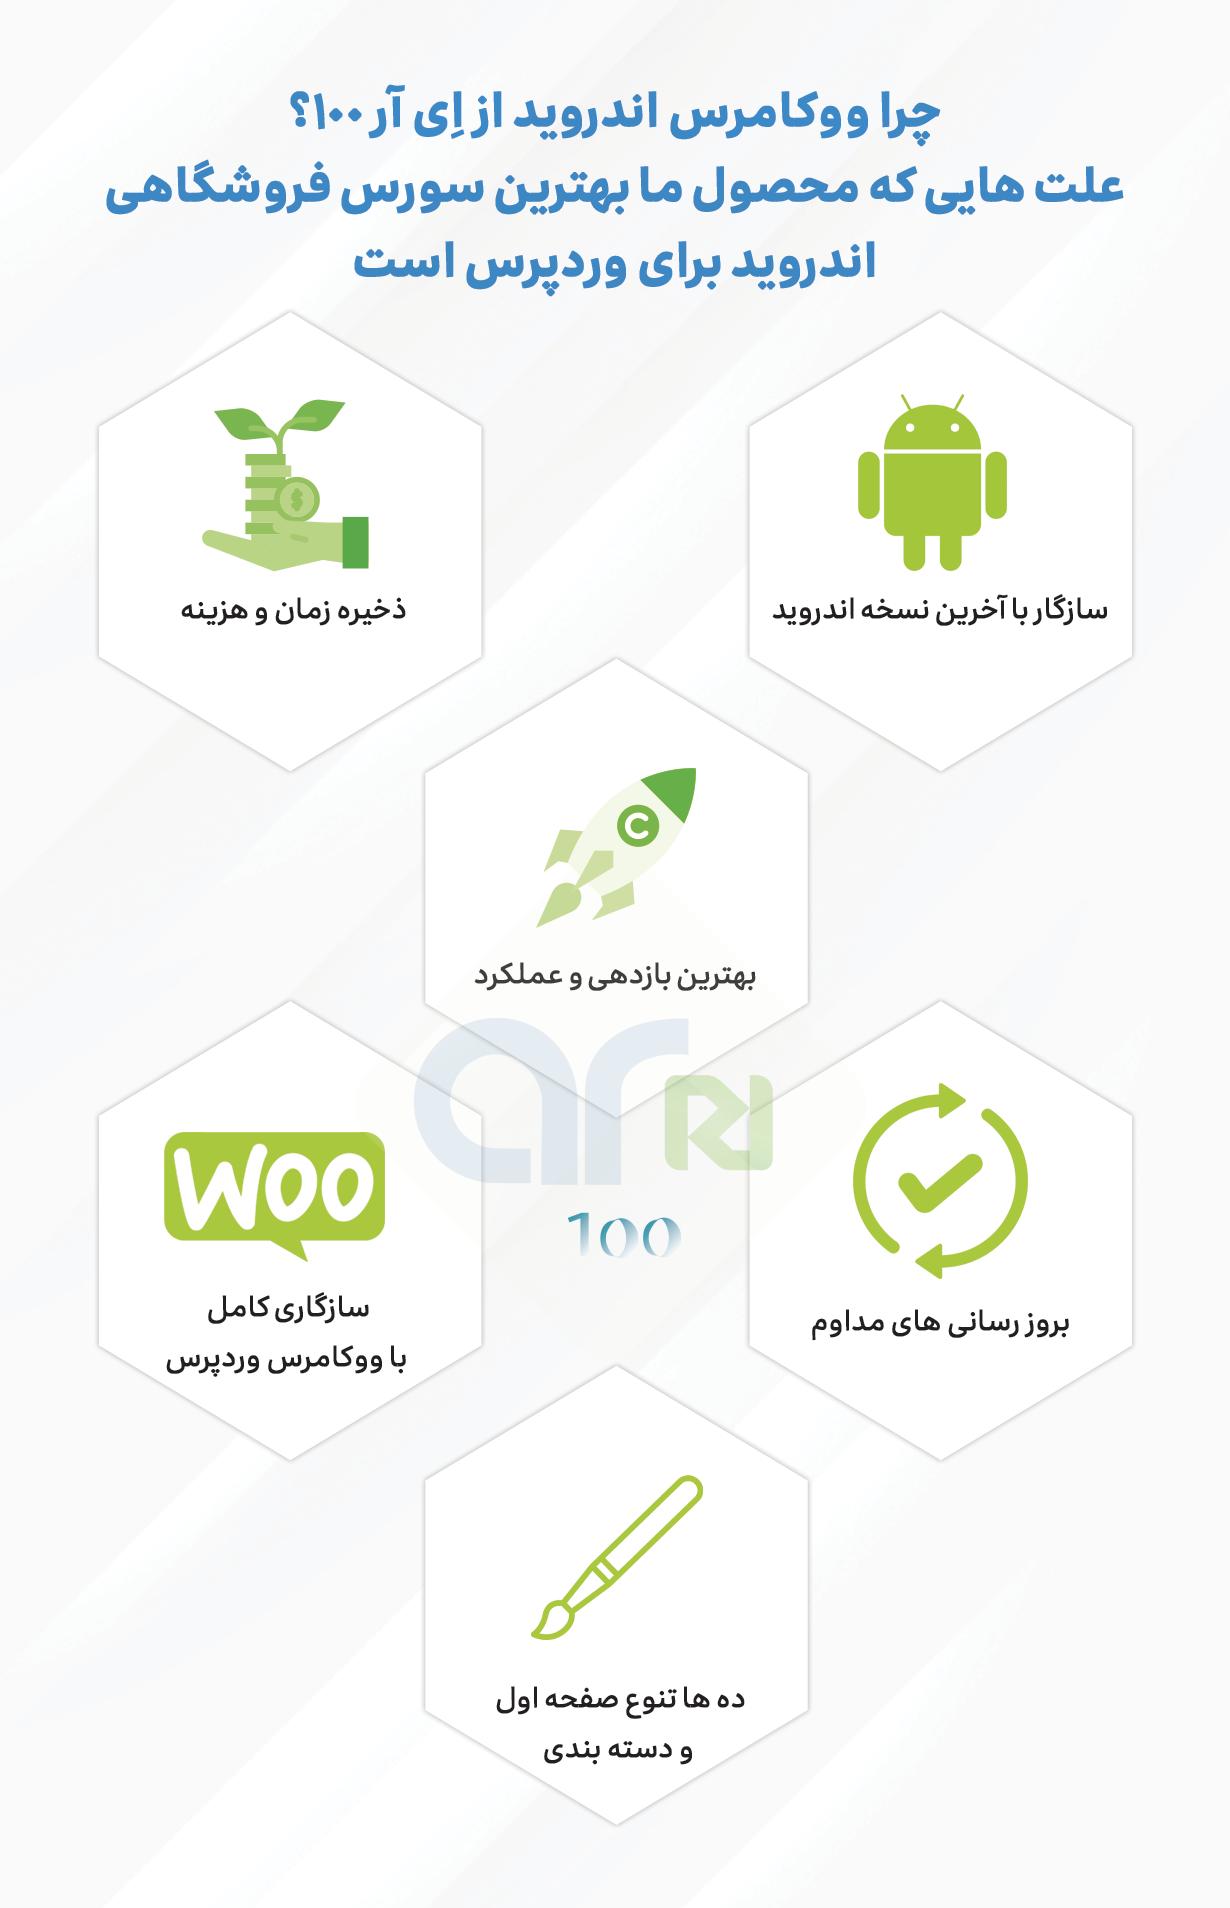 امکانات افزونه Android woocommerce